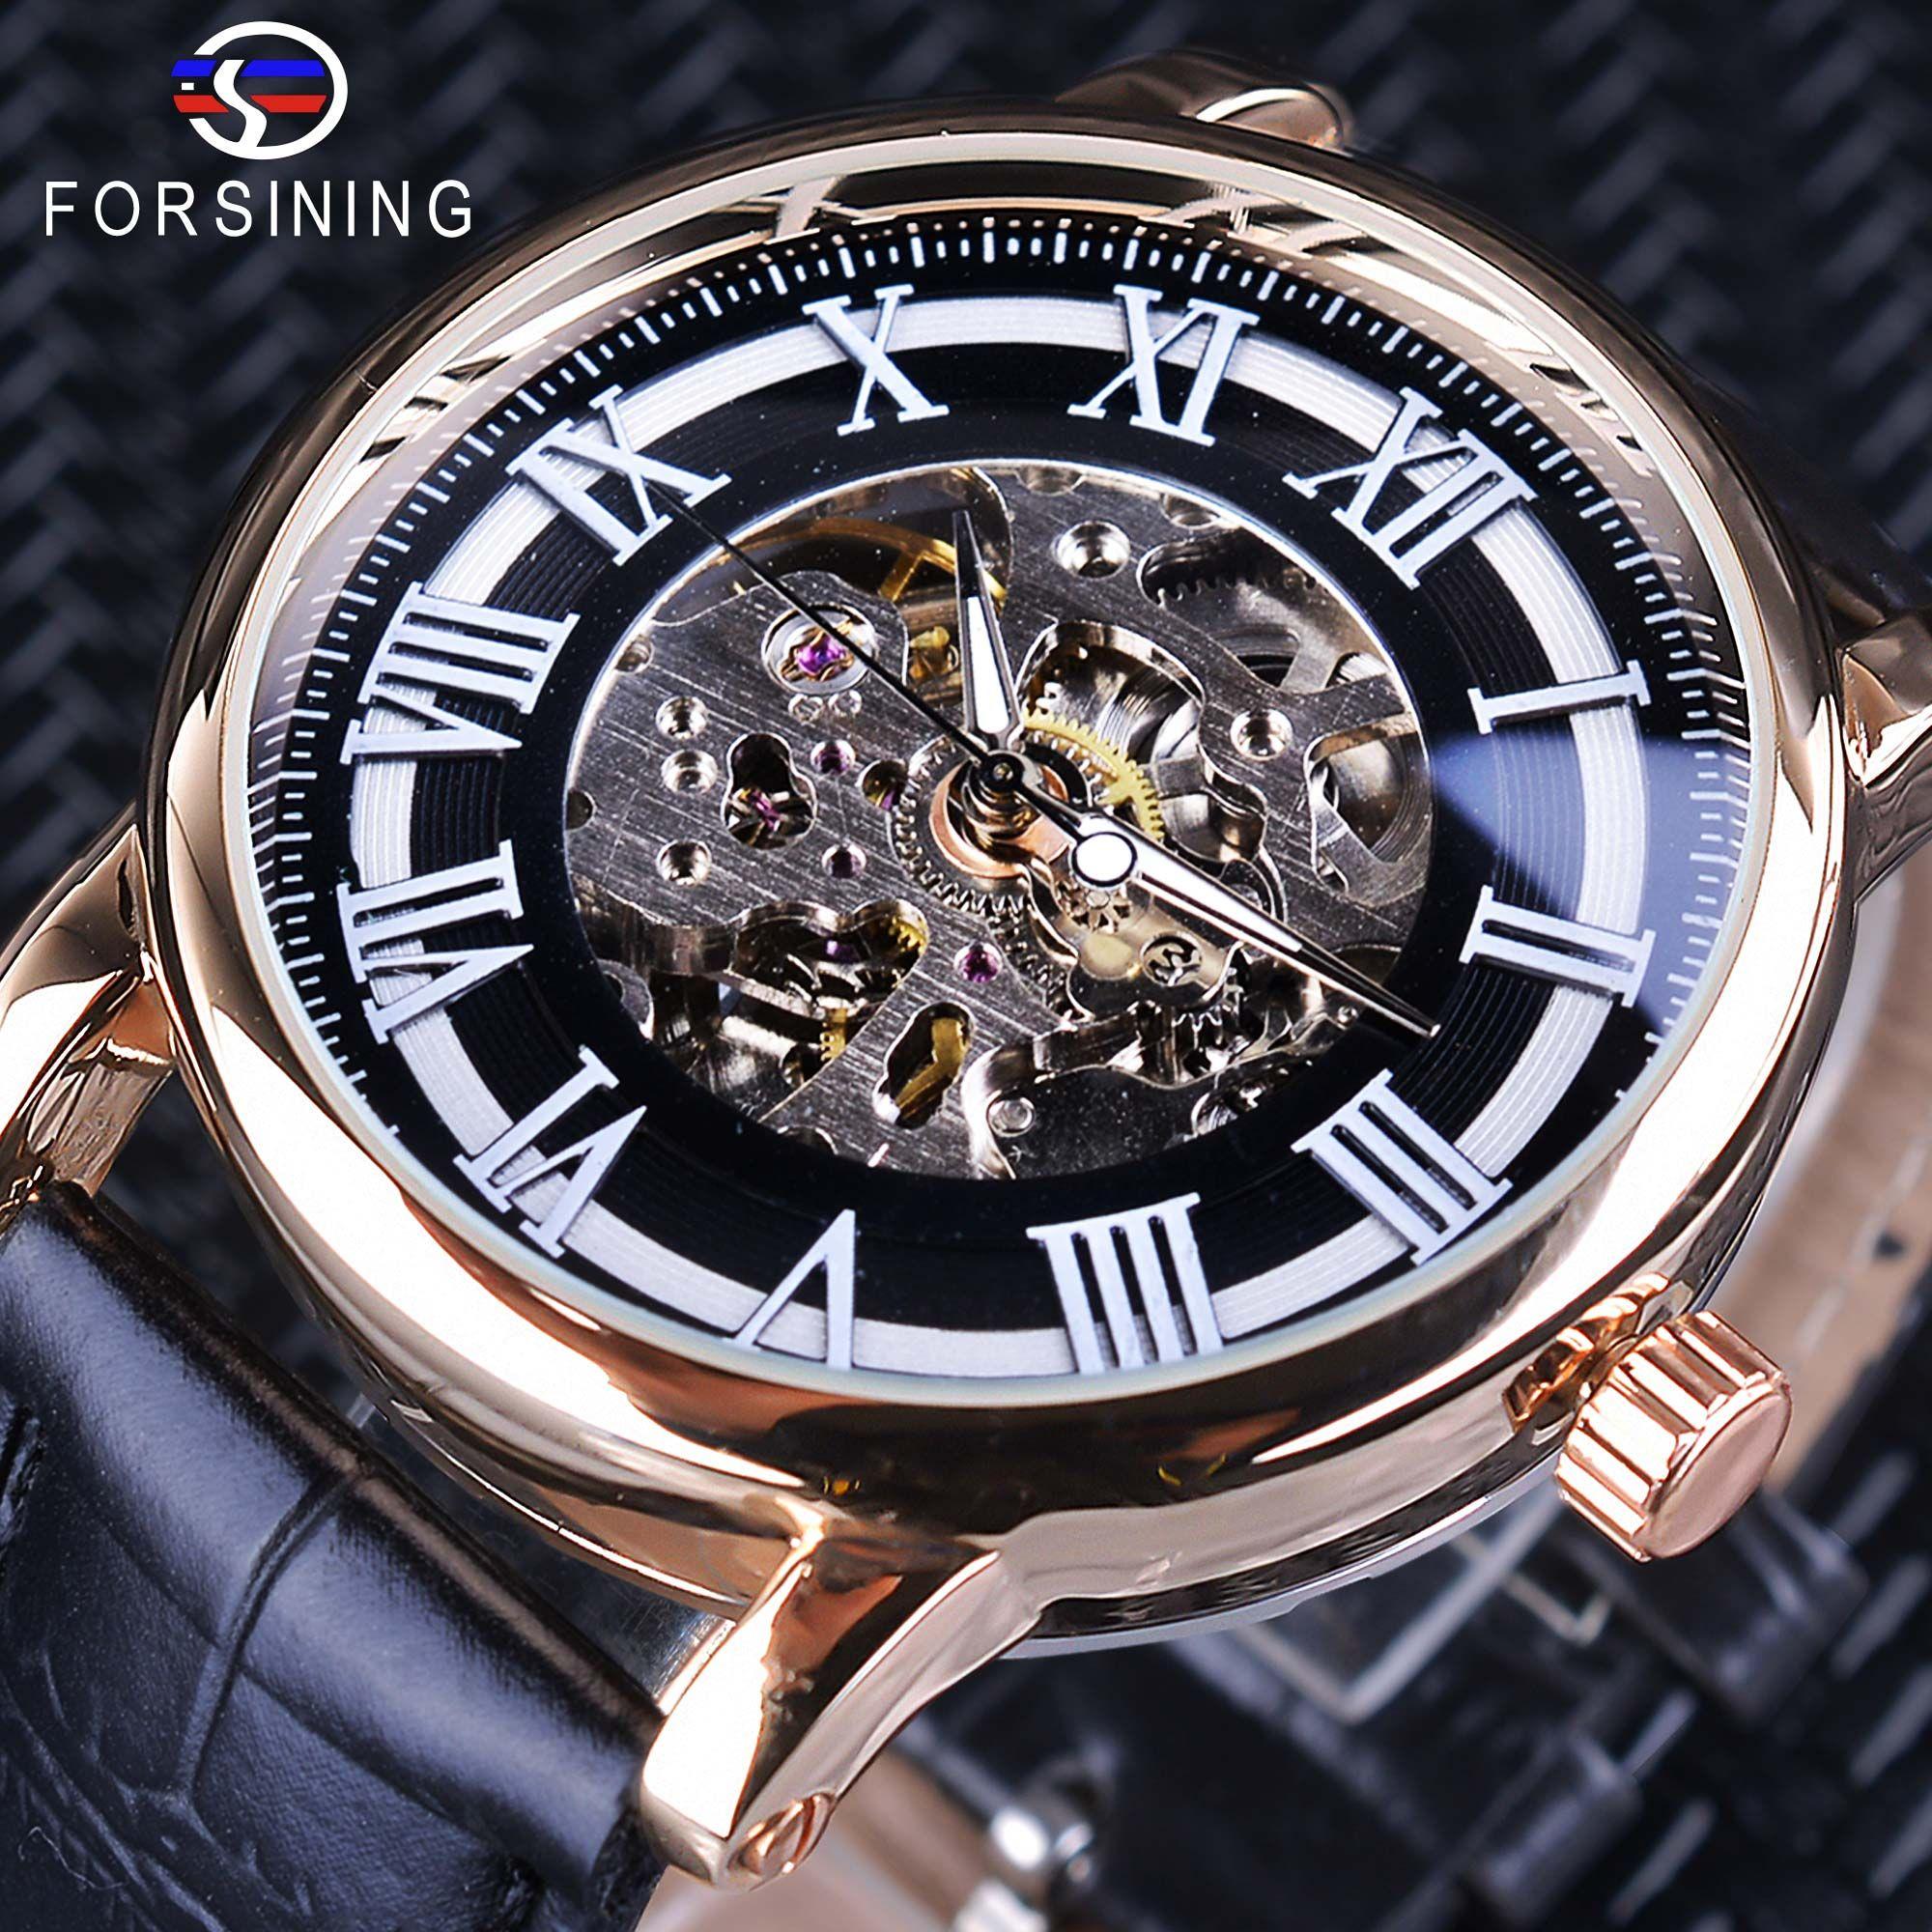 f8d5d99e2e0b Compre Forsining 2018 Retro Relojes Automáticos De Los Hombres Romanos De  Primeras Marcas De Lujo Negro Esqueleto Luminoso Reloj De Pulsera Masculino  Reloj ...